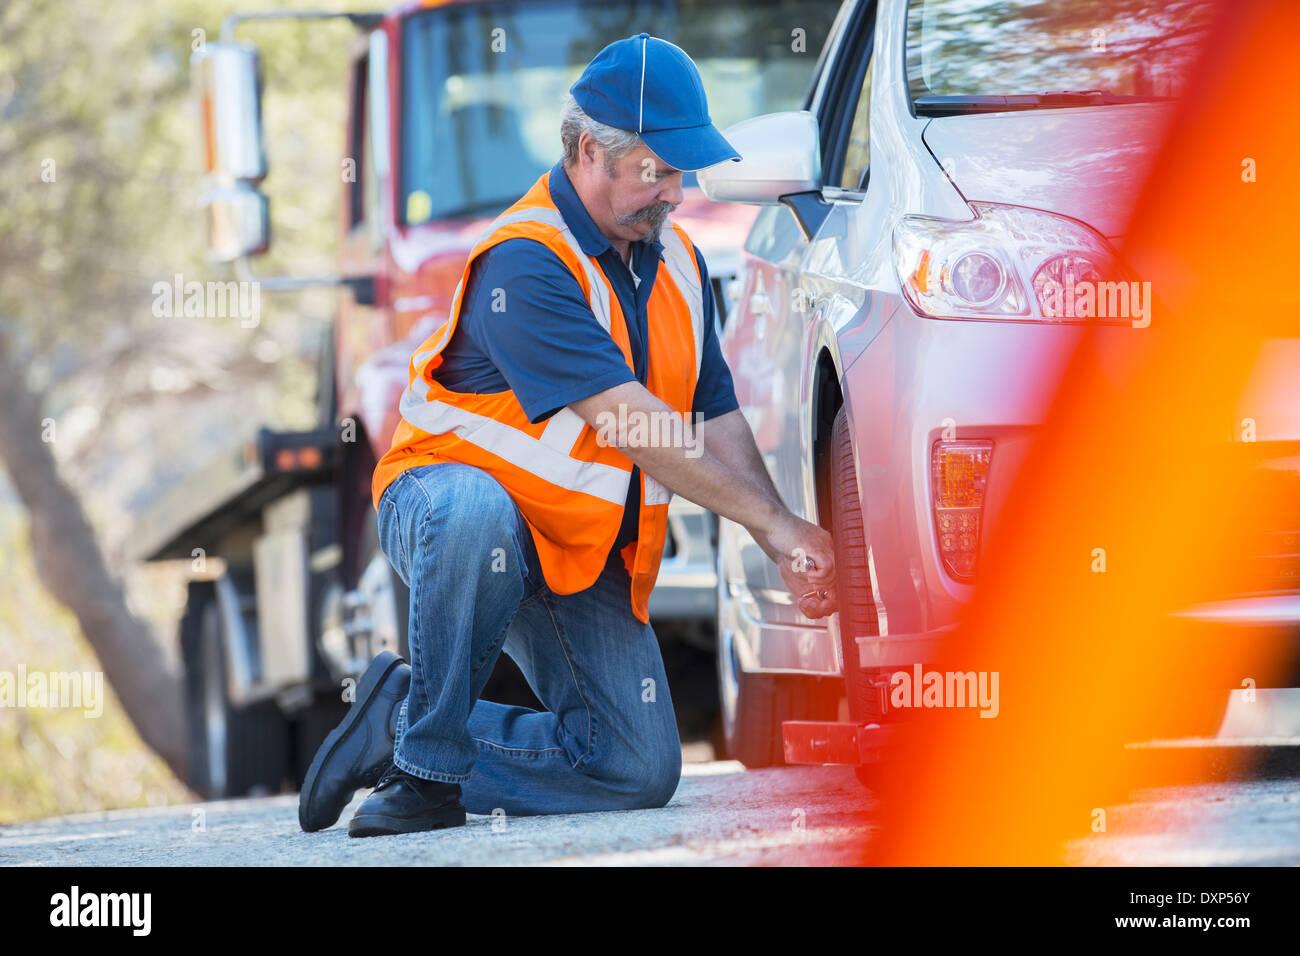 Roadside mechanic repairing flat tire Stock Photo